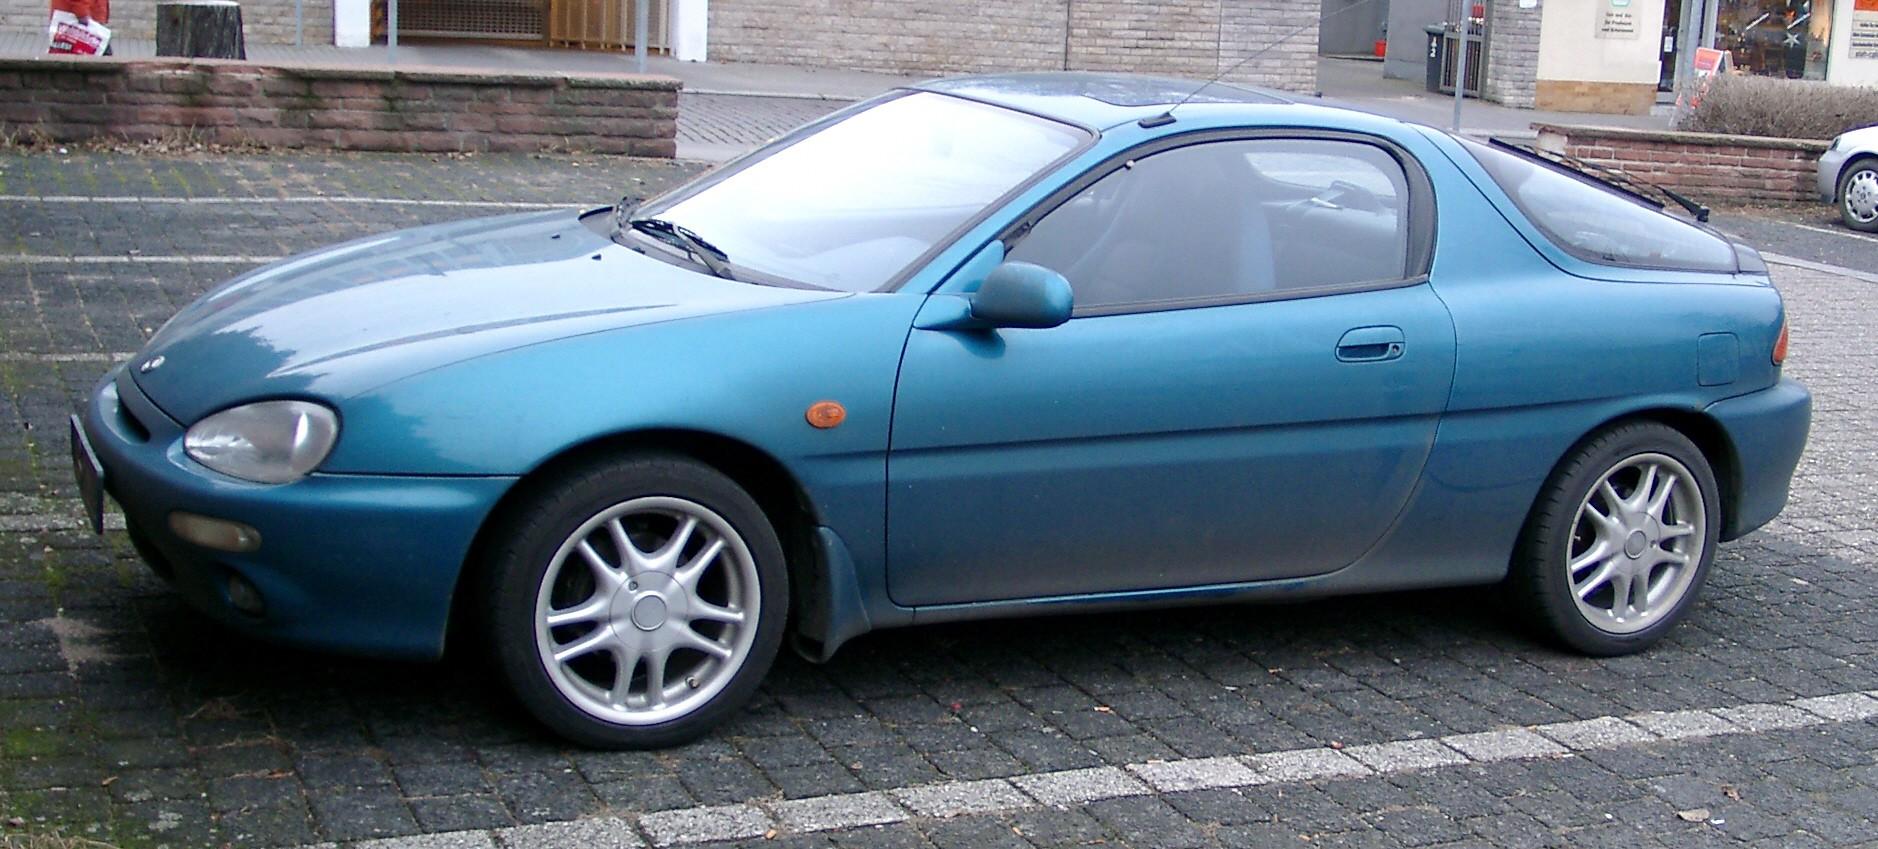 File:Mazda MX-3 front 20080103.jpg - Wikimedia Commons